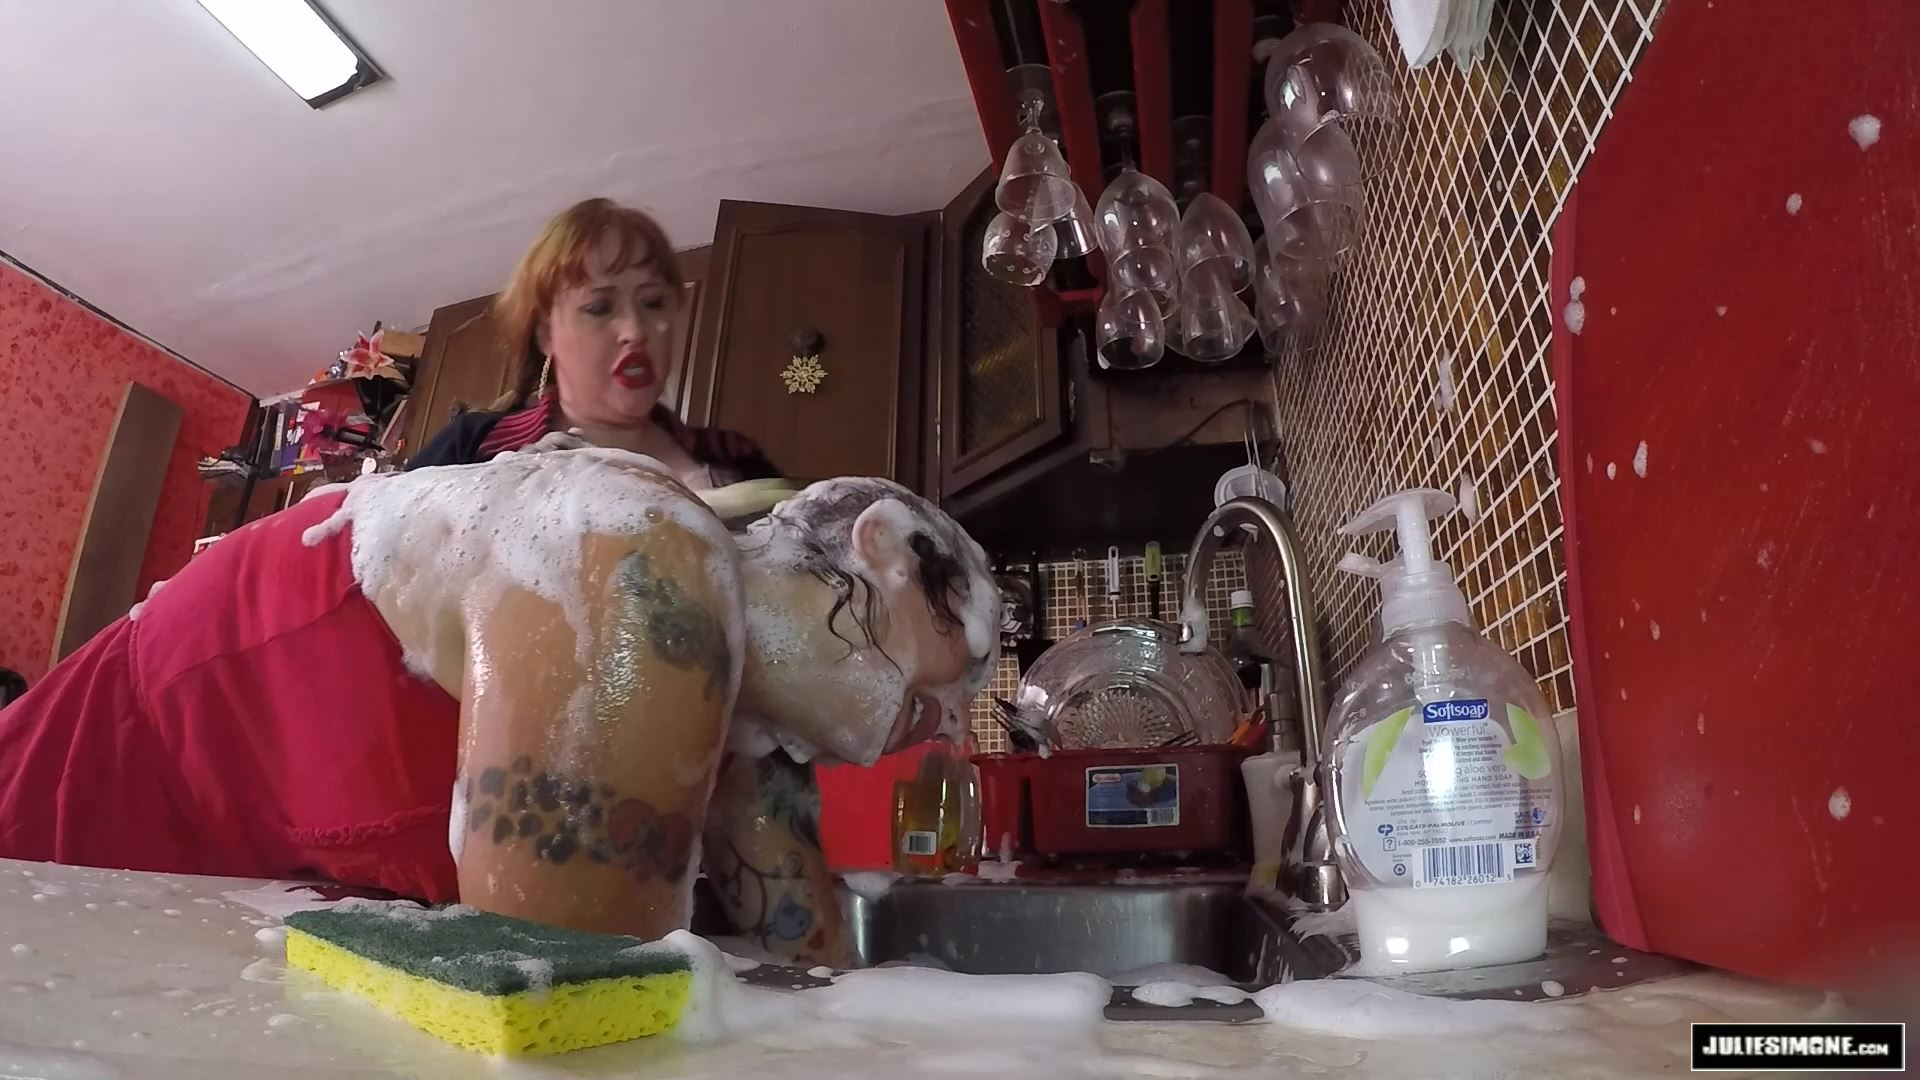 Nikki Sebastian, Julie Simone In Scene: Nikki Extreme Hair Washing - JULIESIMONE - FULL HD/1080p/MP4